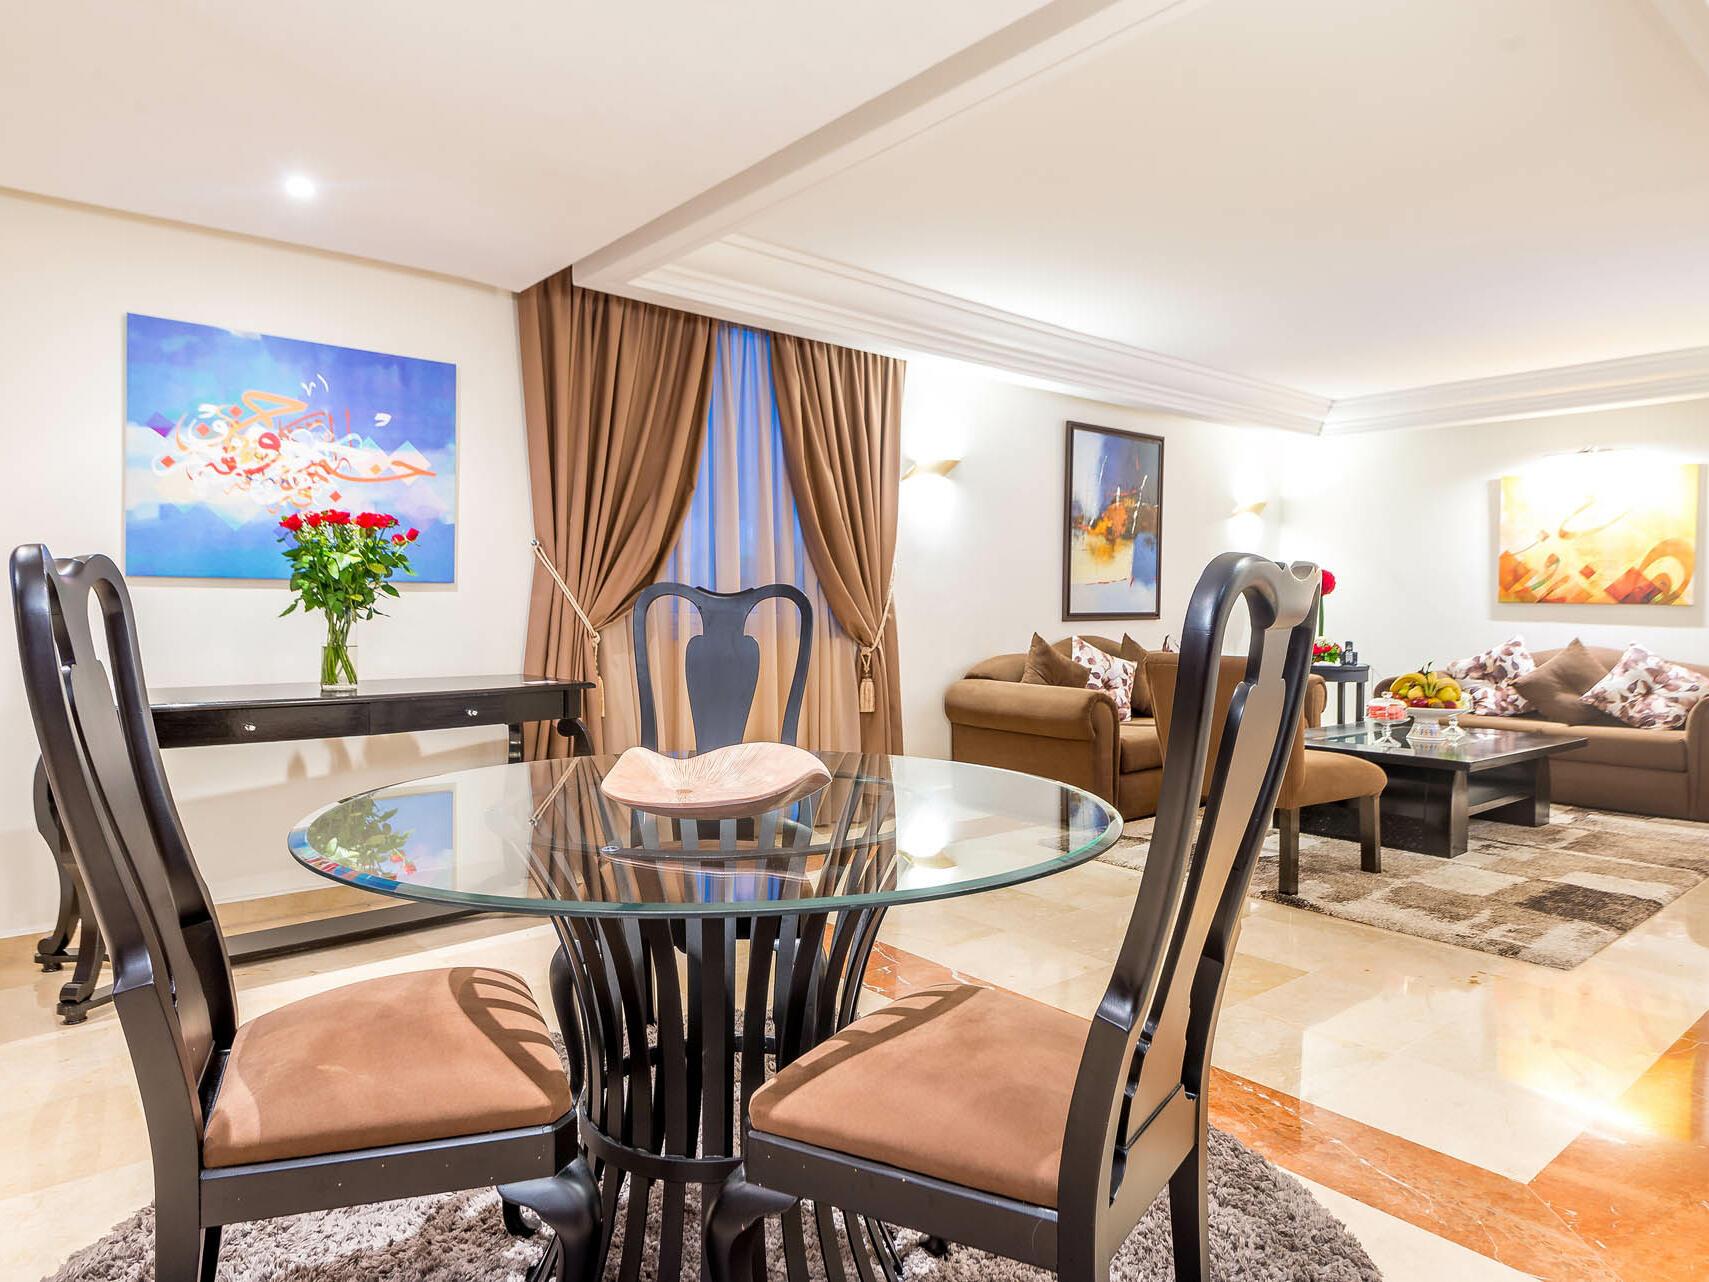 Table and Sofa inside the Room -   Farah Rabat Hotel